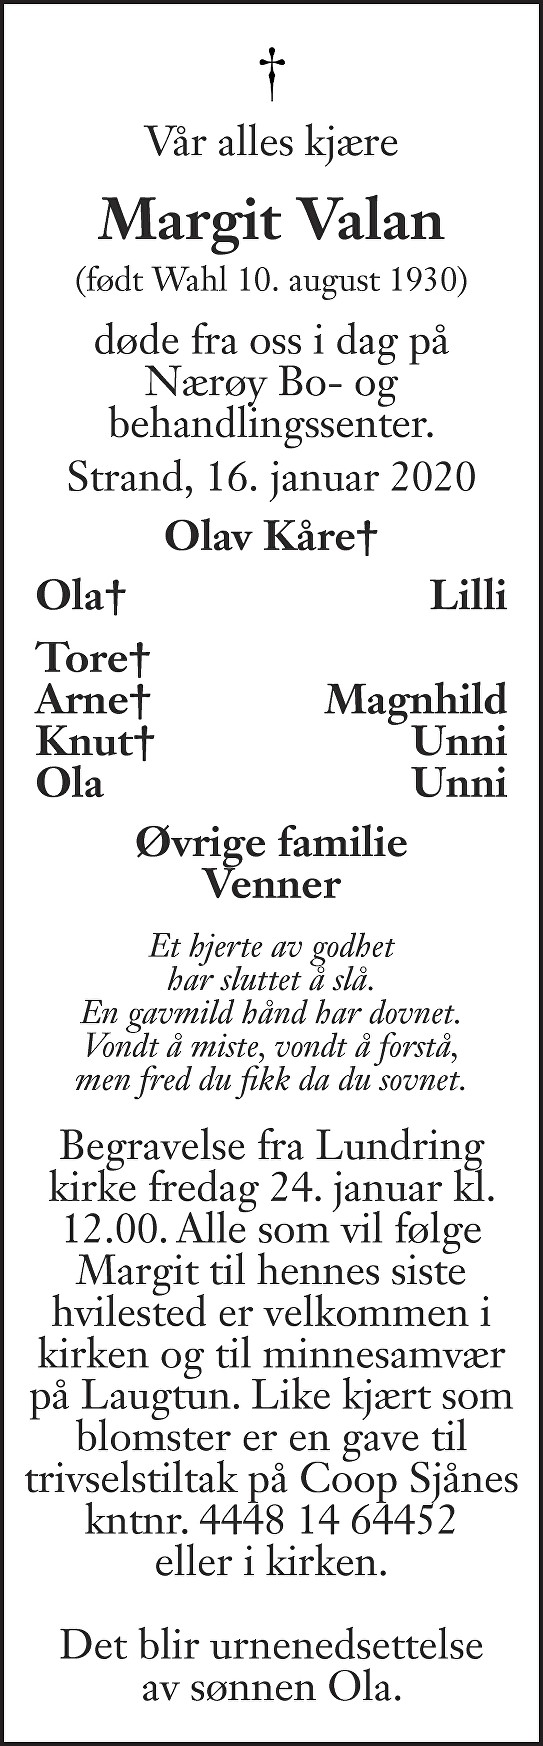 Margit Valan Dødsannonse